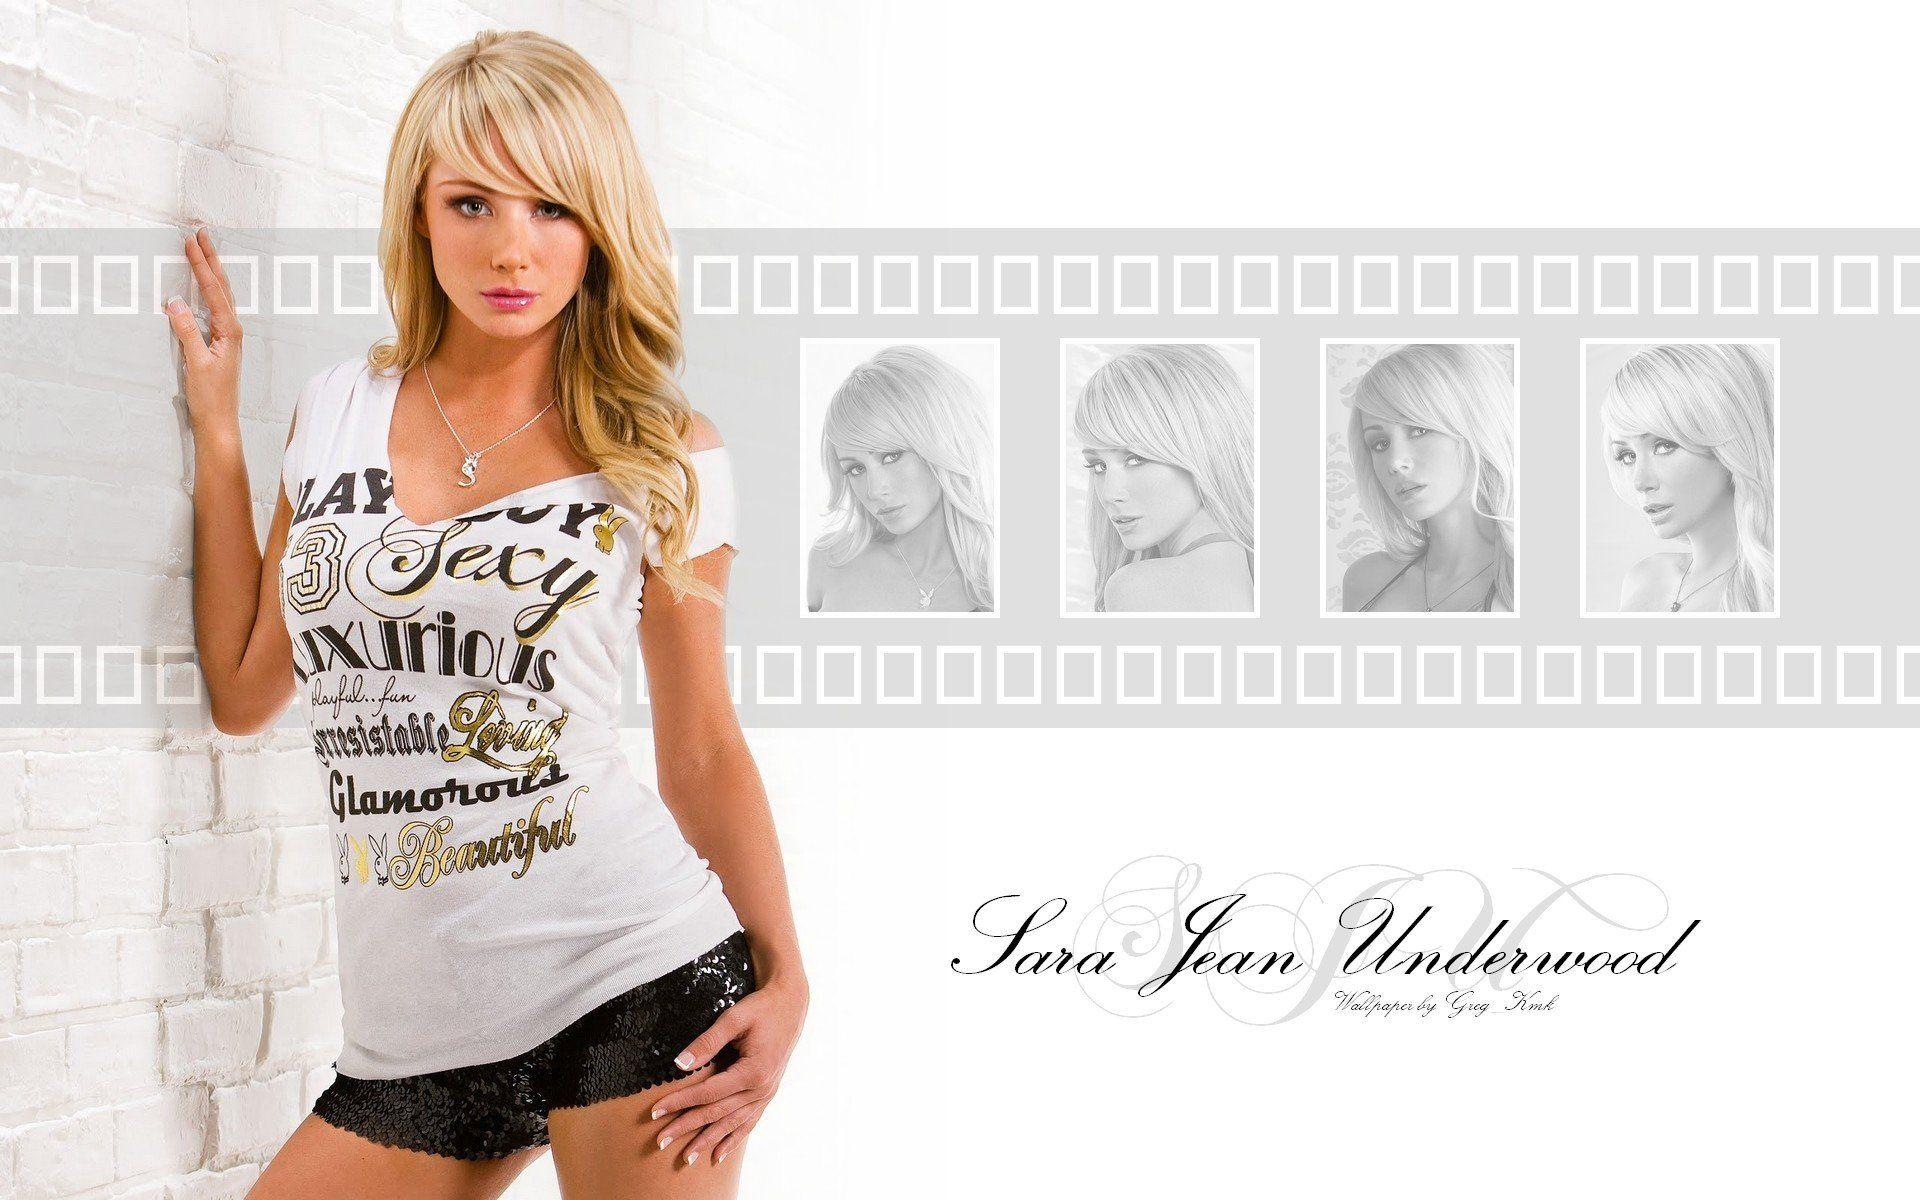 Sara Jean Underwood Wallpapers Top 1920x1200 38